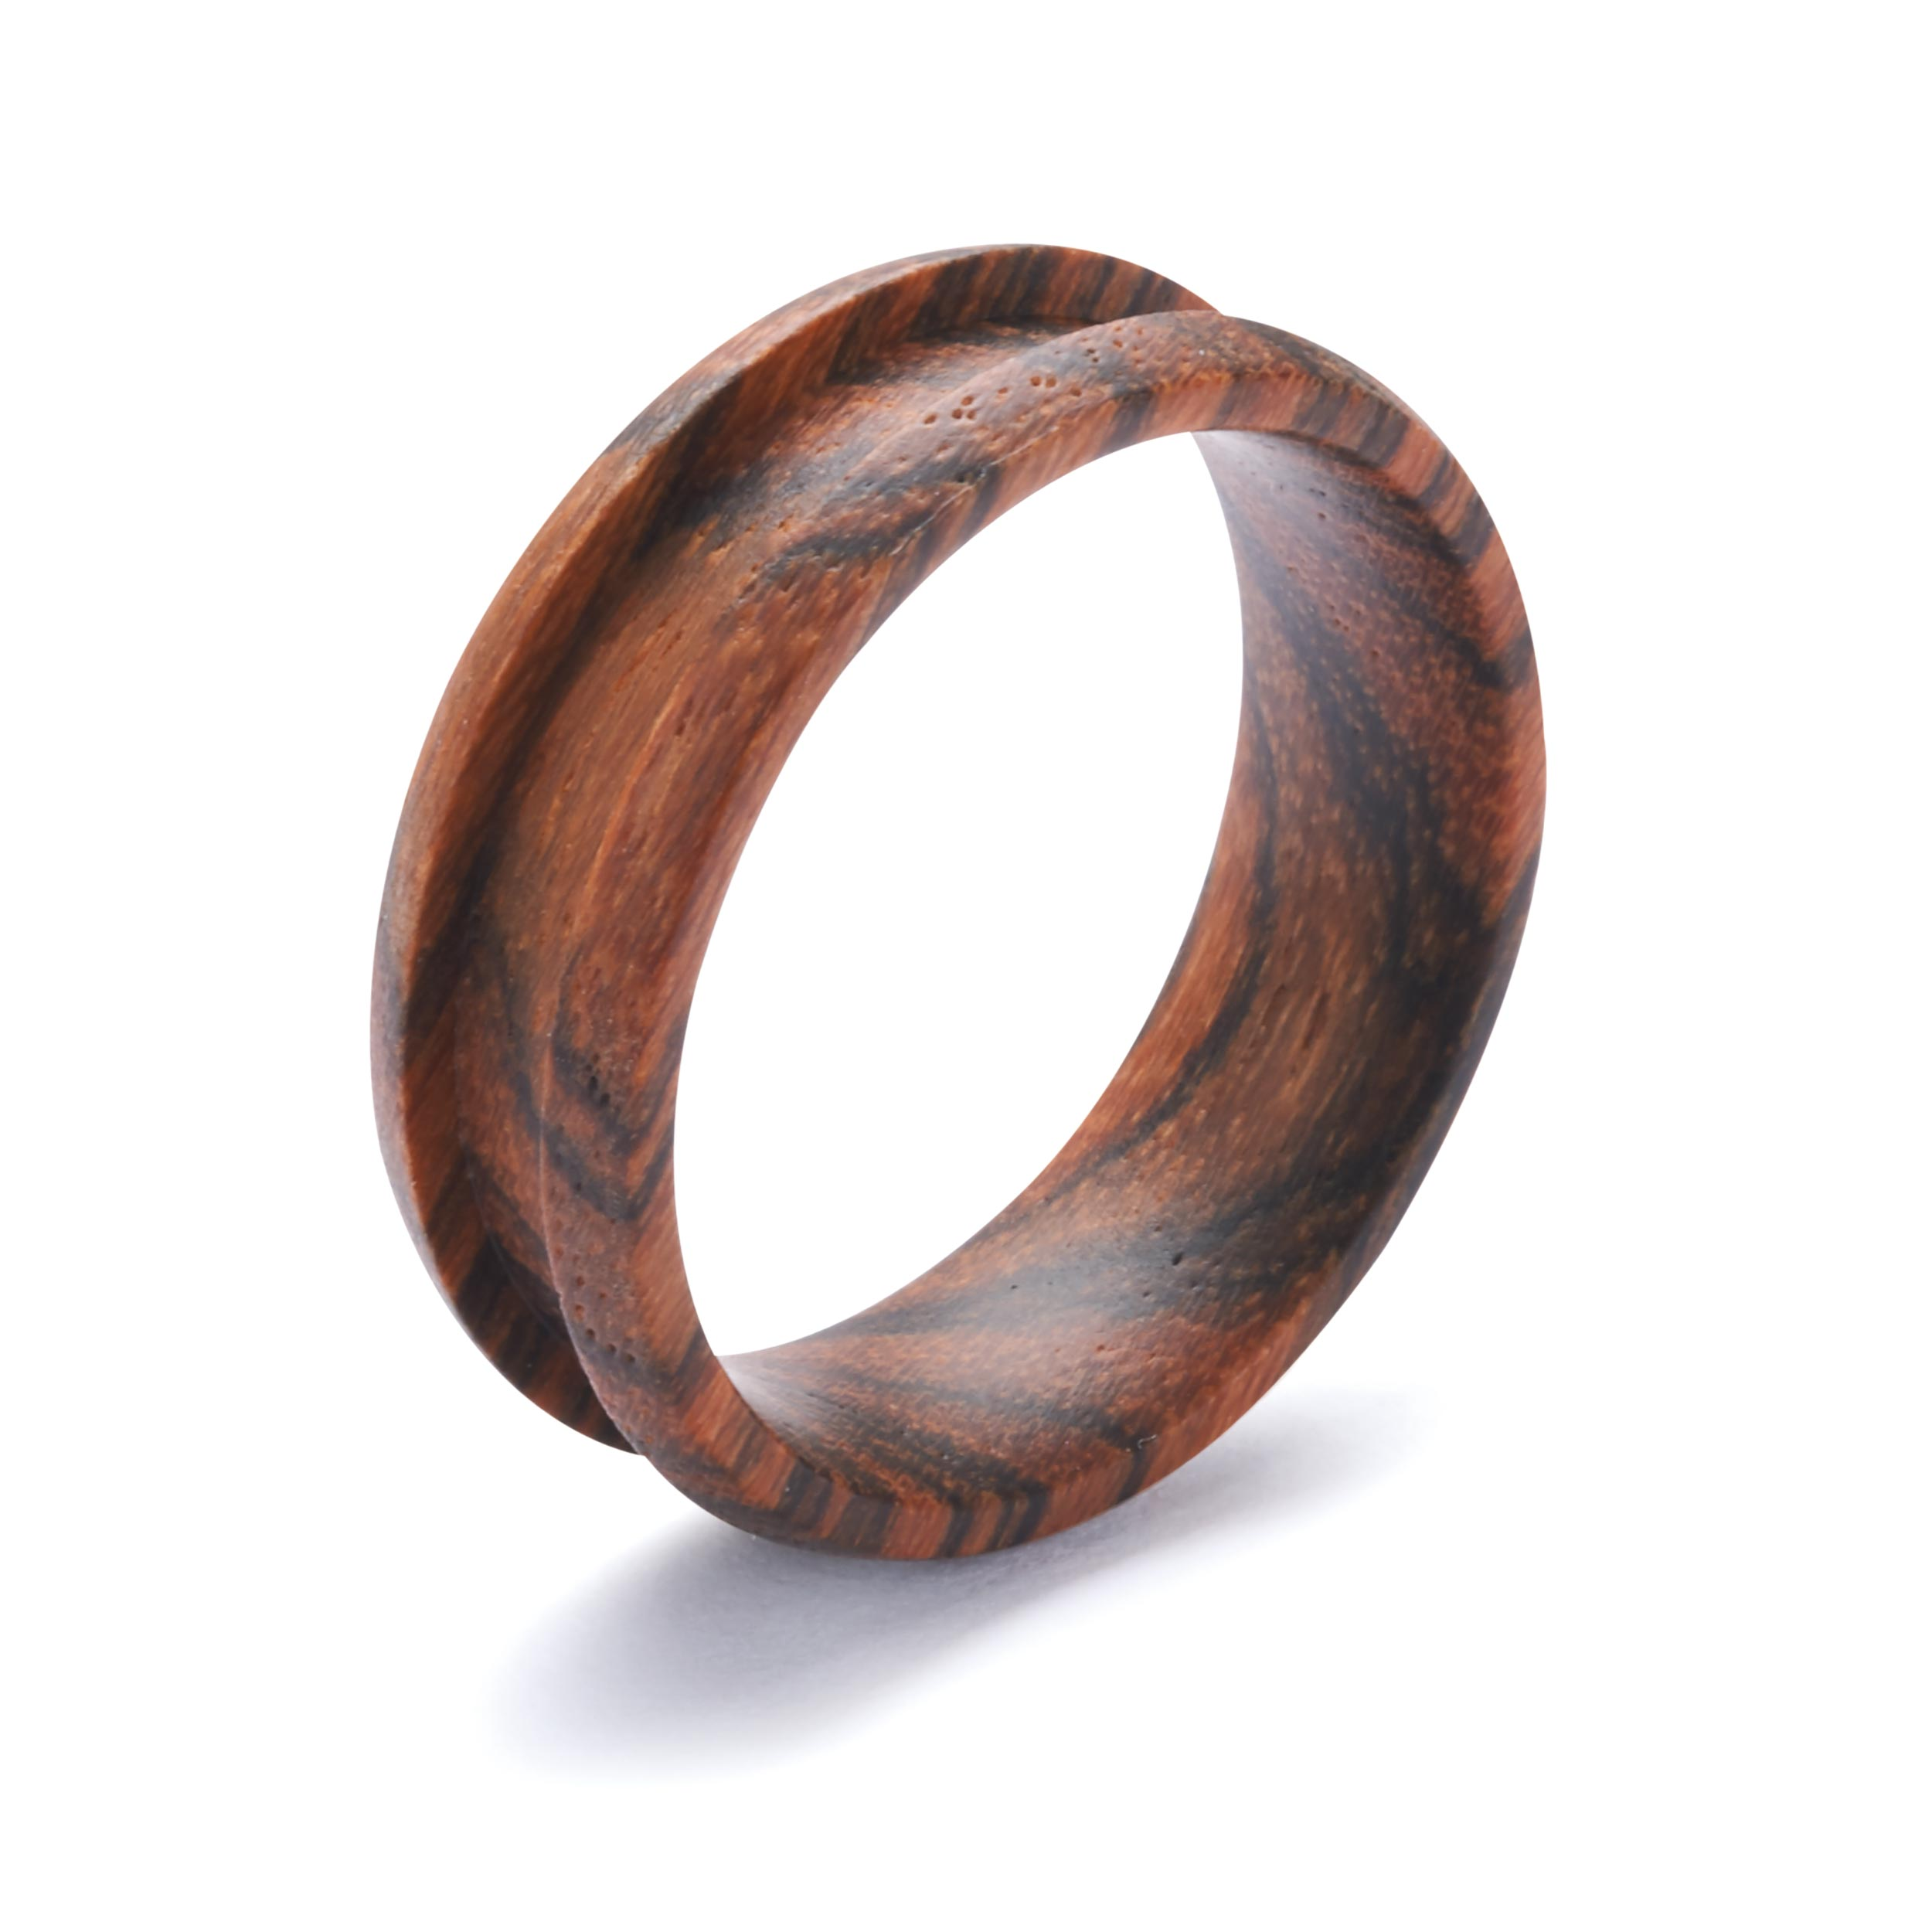 Comfort Ring Core - Bocote - 8mm, Size 13